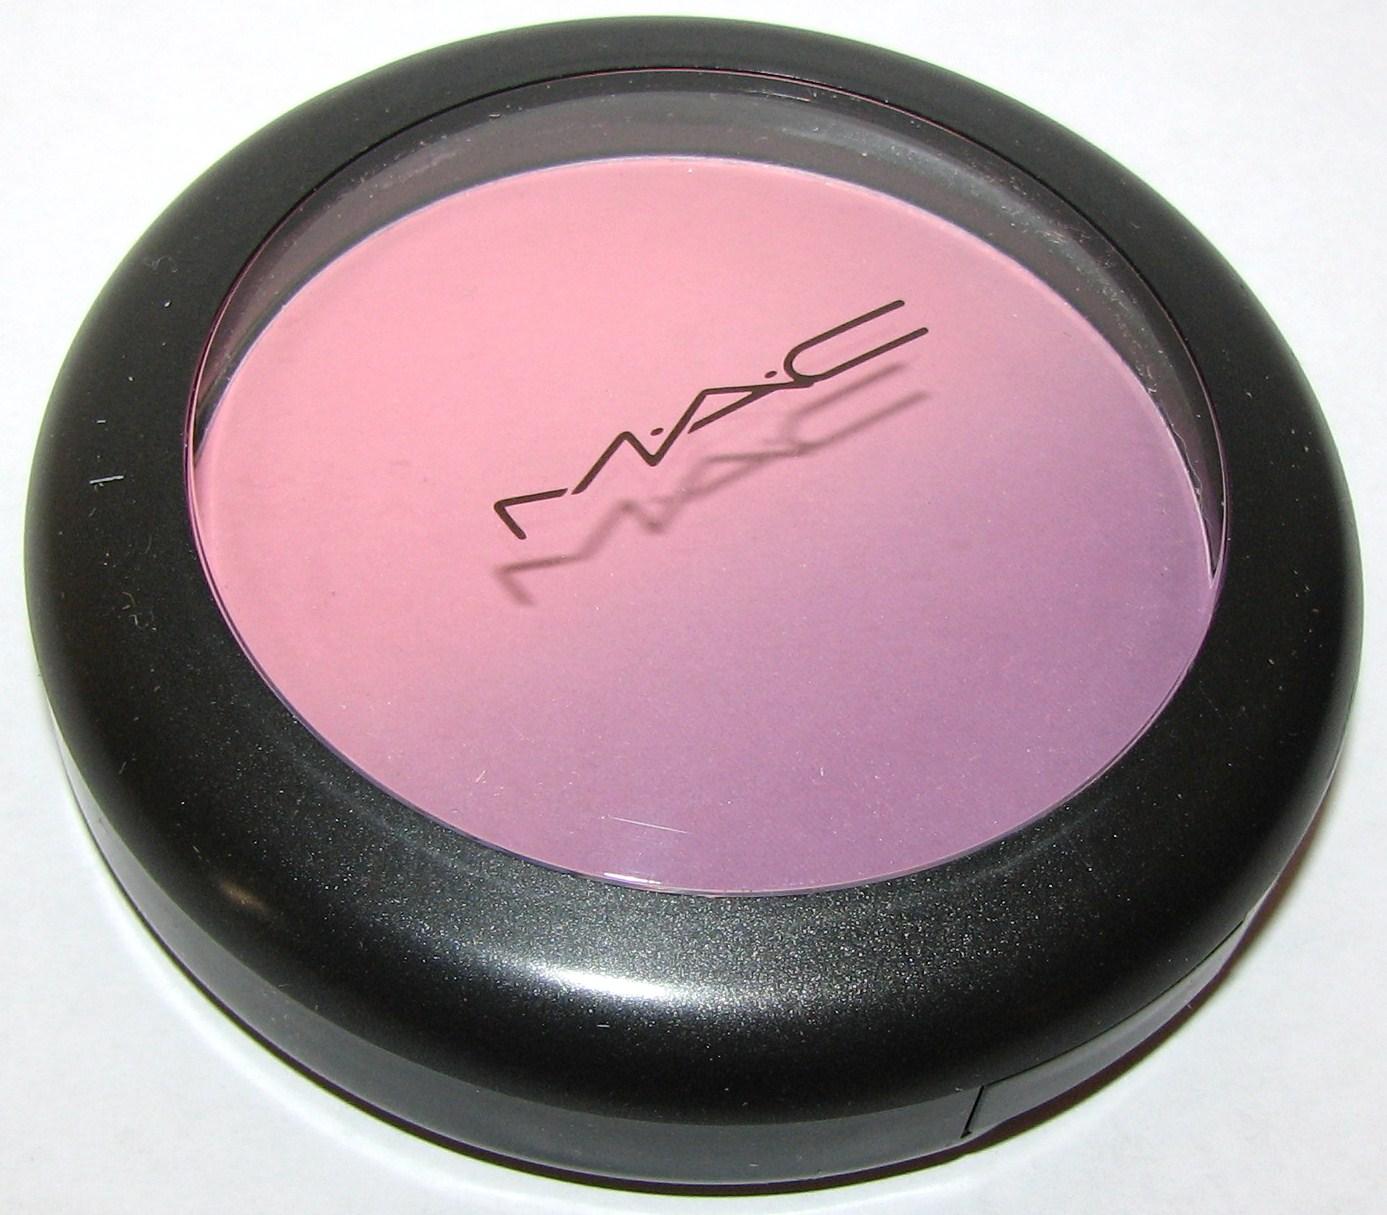 mac azalea blossom blush - photo #36